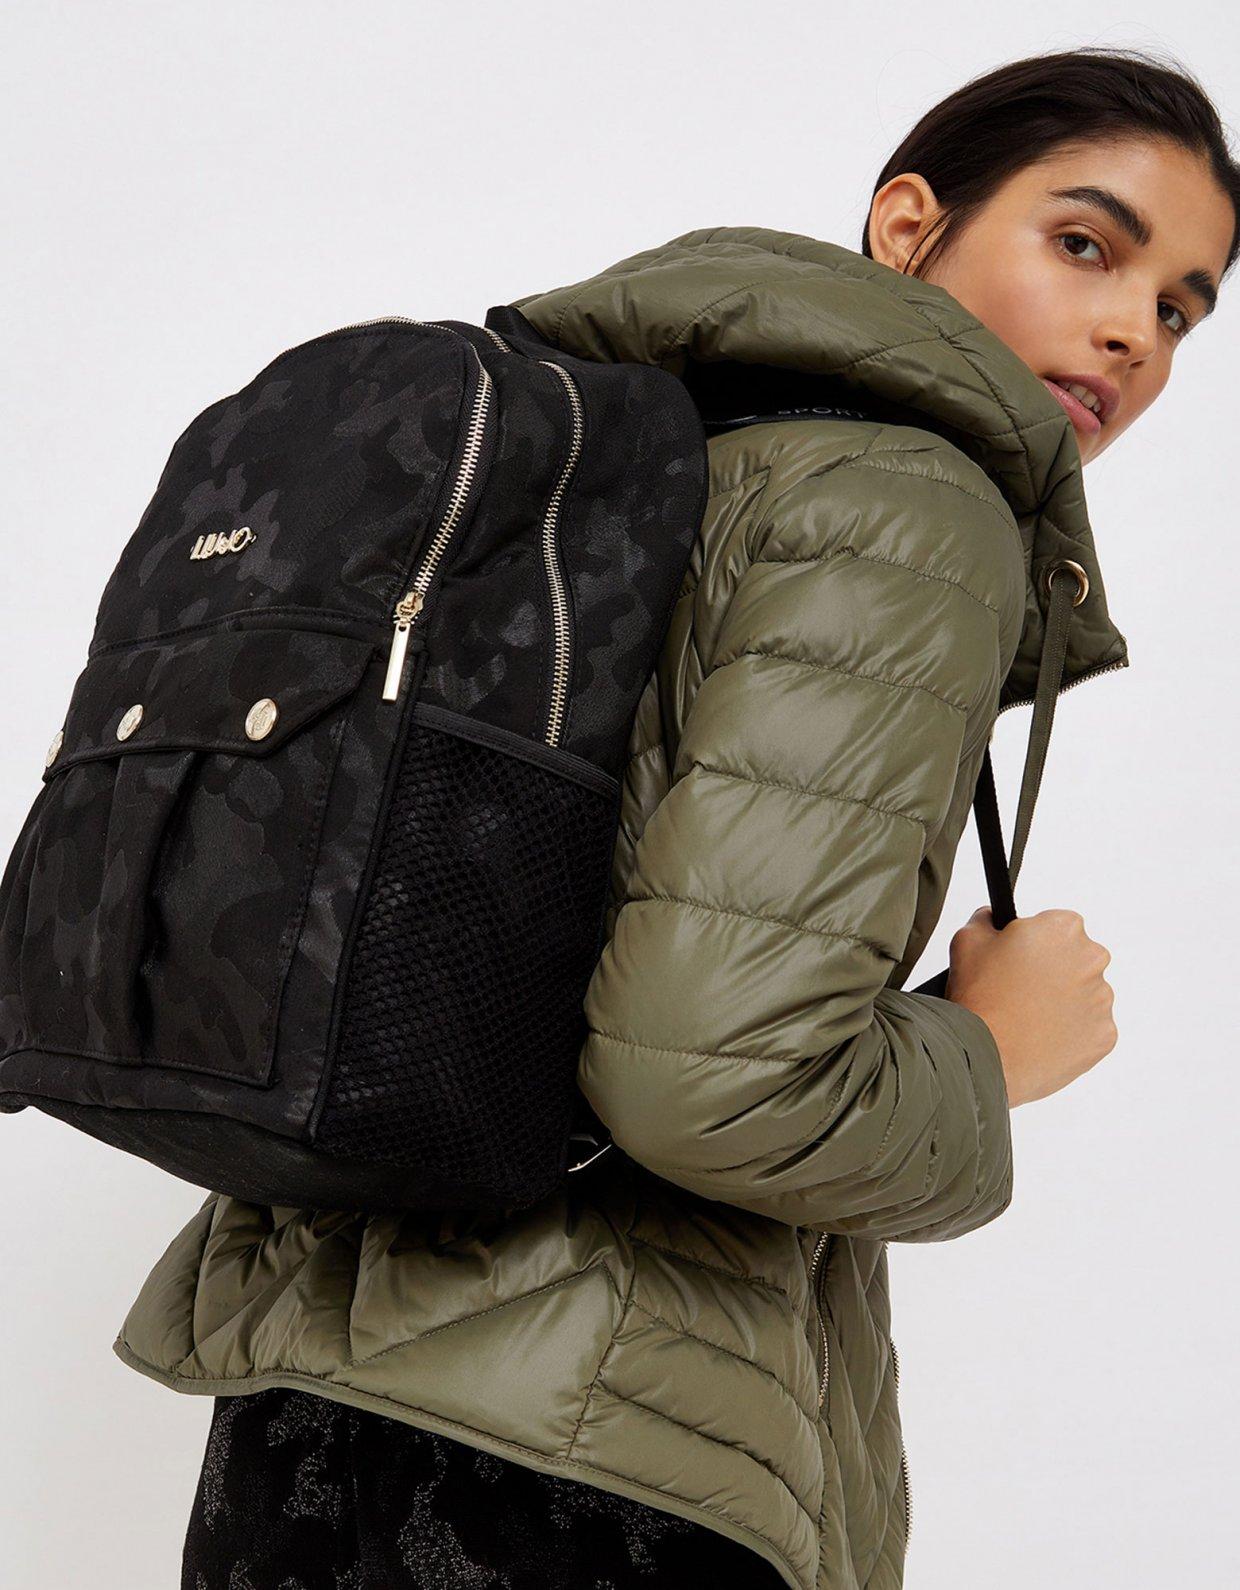 Liu Jo Jacquard camouflage backpack nero